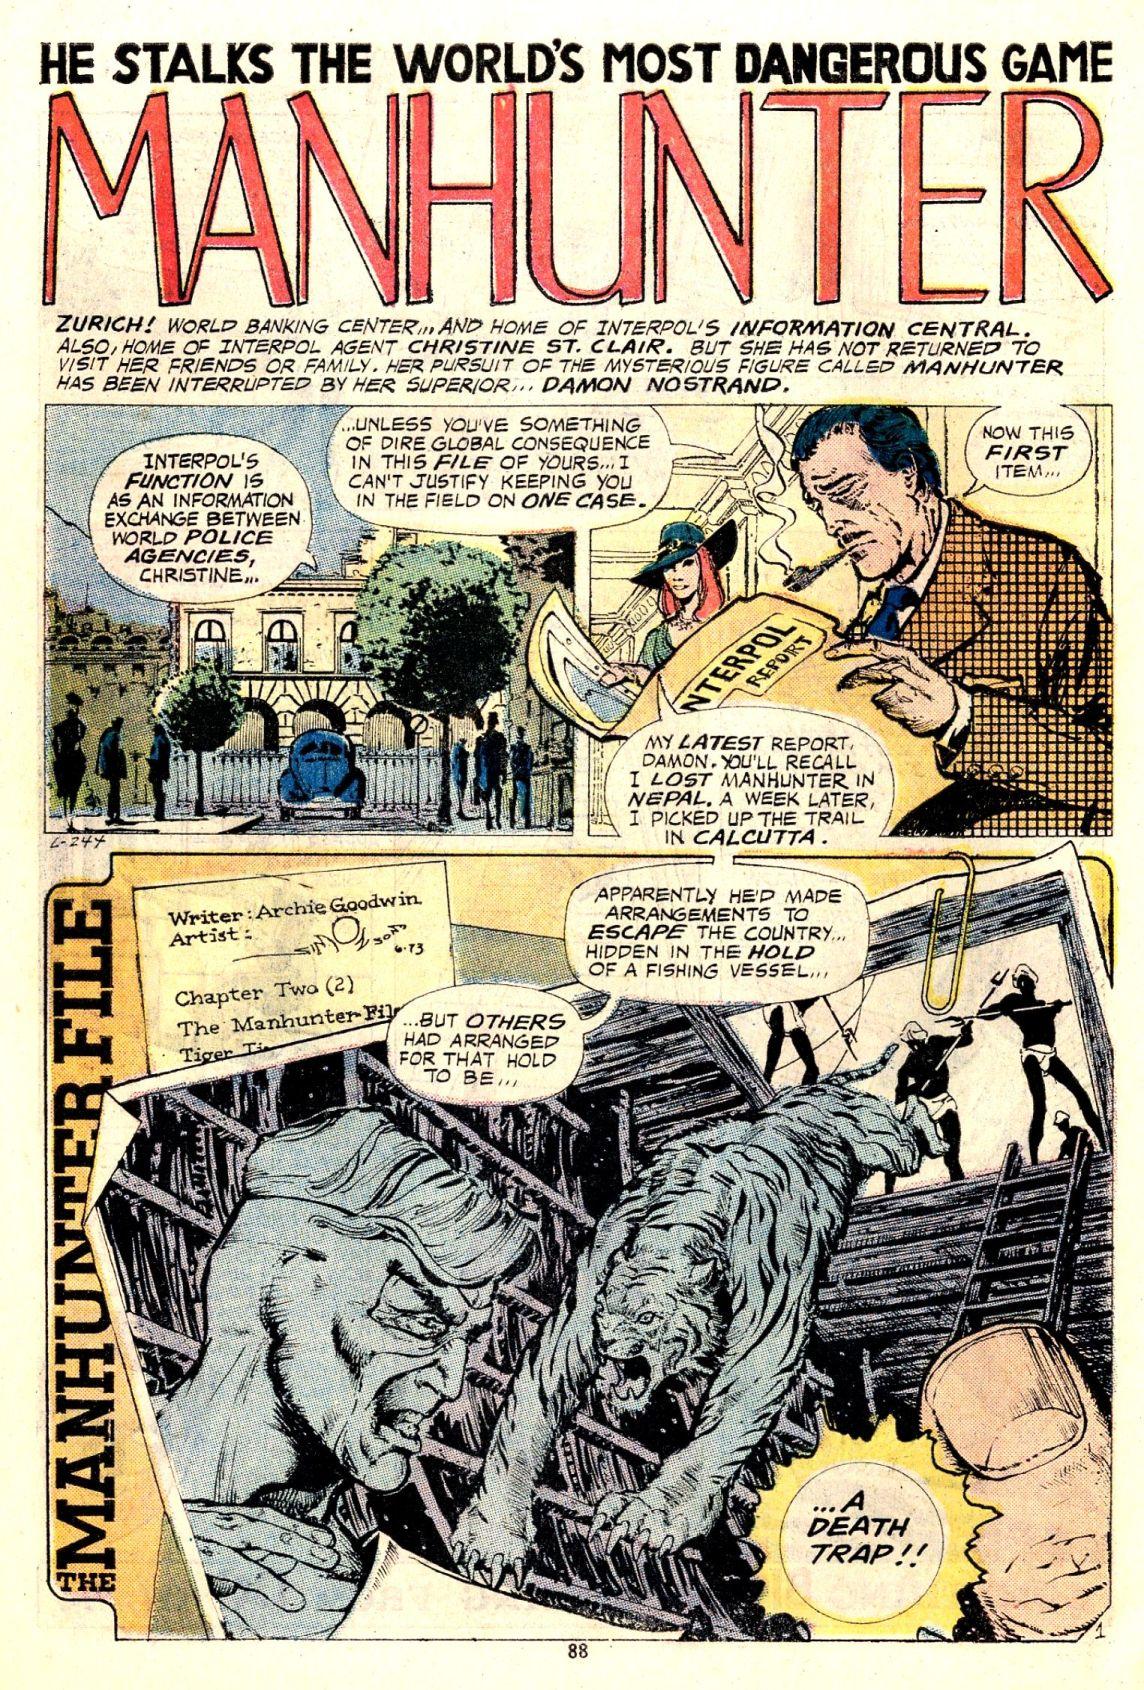 Detective Comics (1937) 438 Page 88